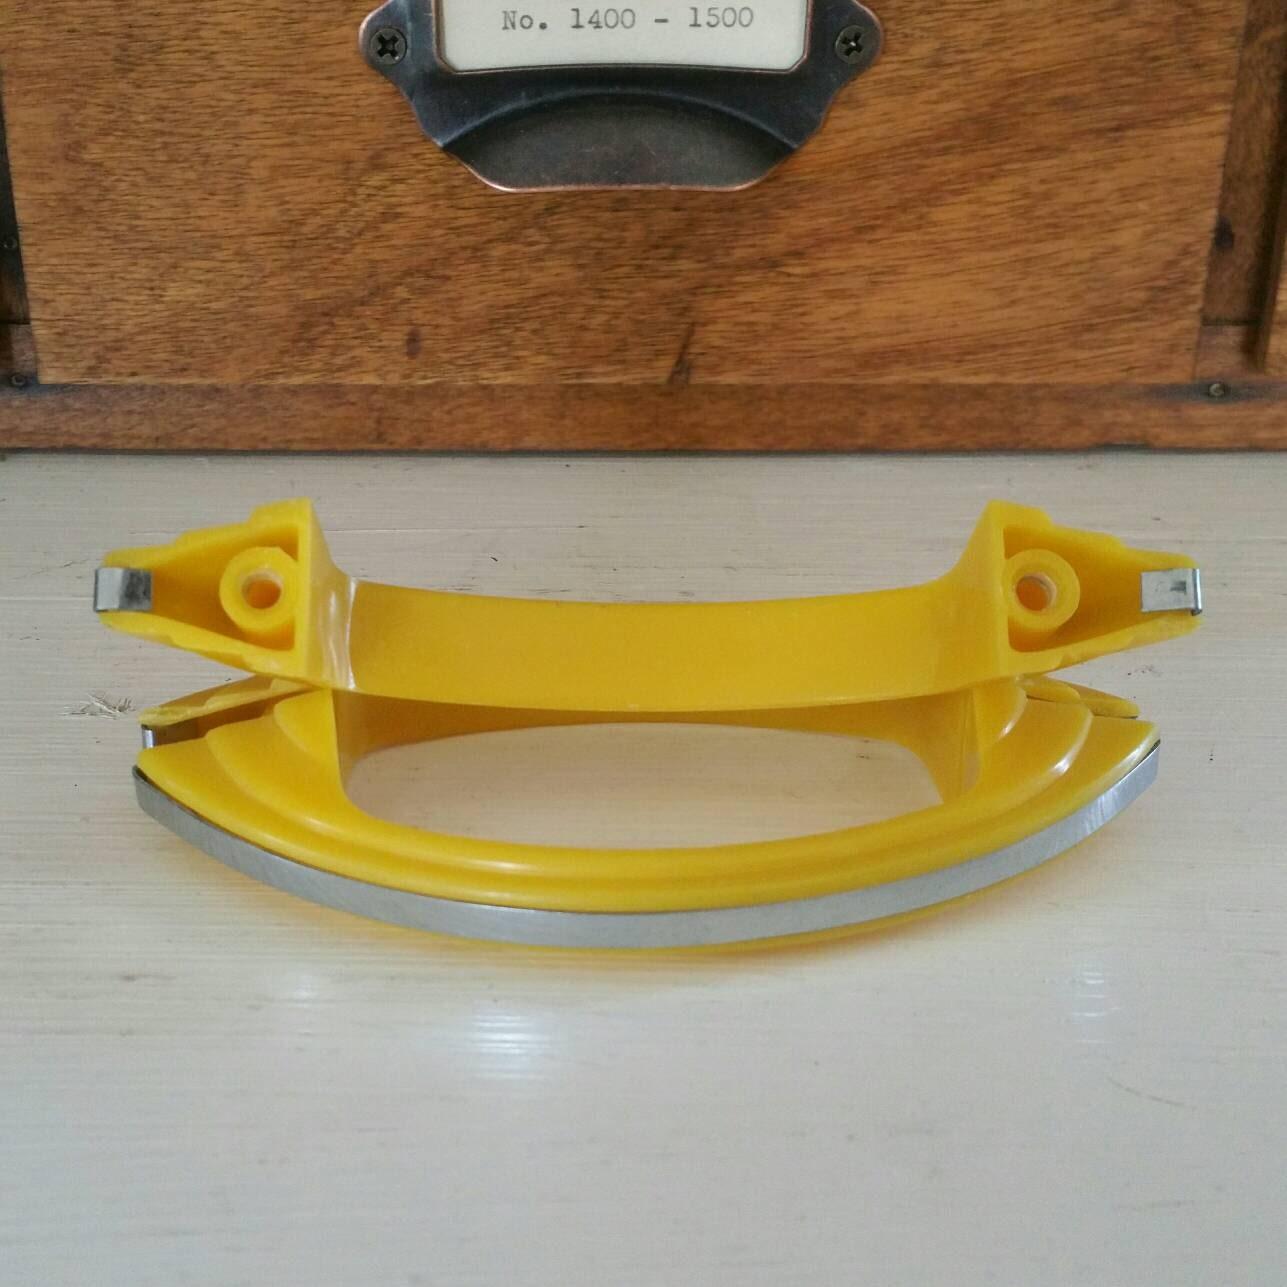 Vintage Art Deco Style Yellow Plastic And Chrome Handles